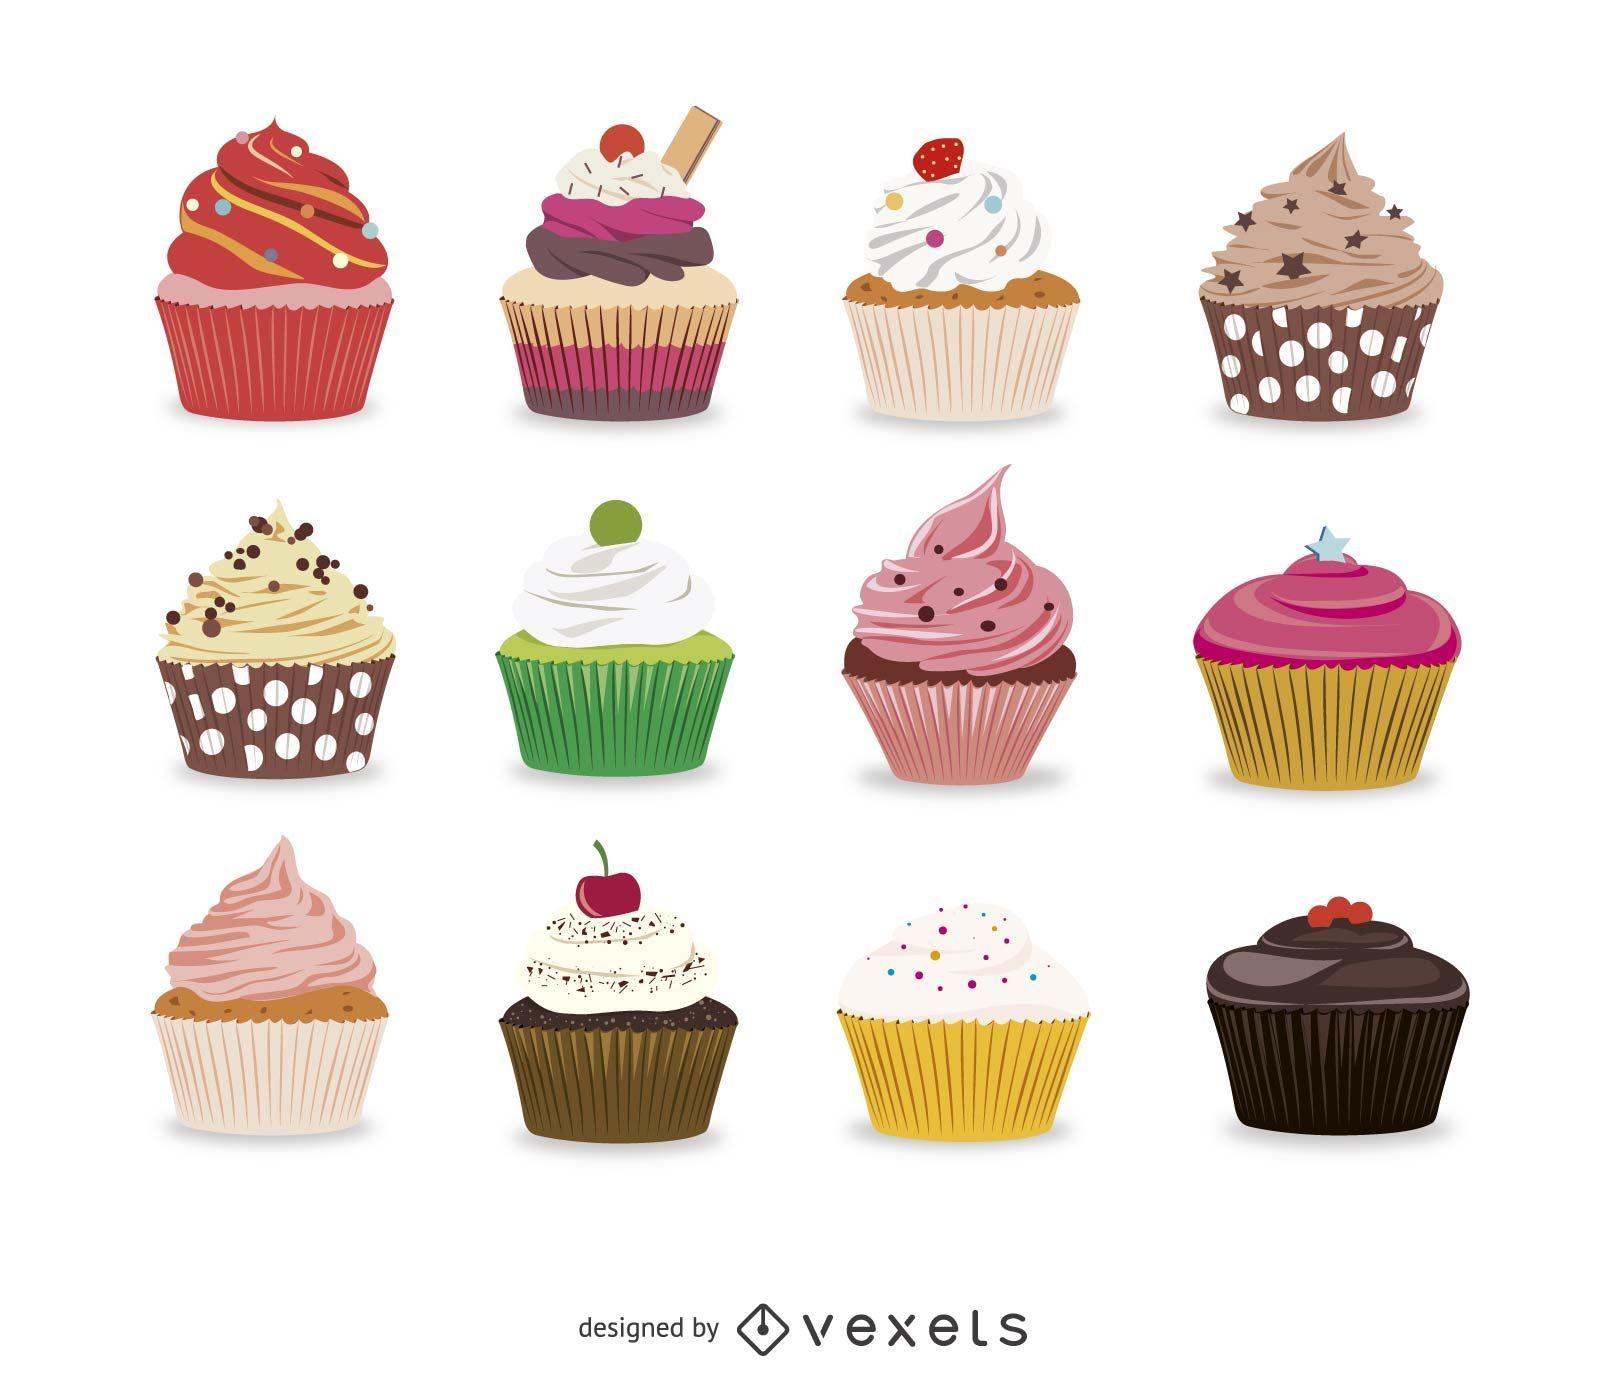 Colección de cupcakes ilustrados